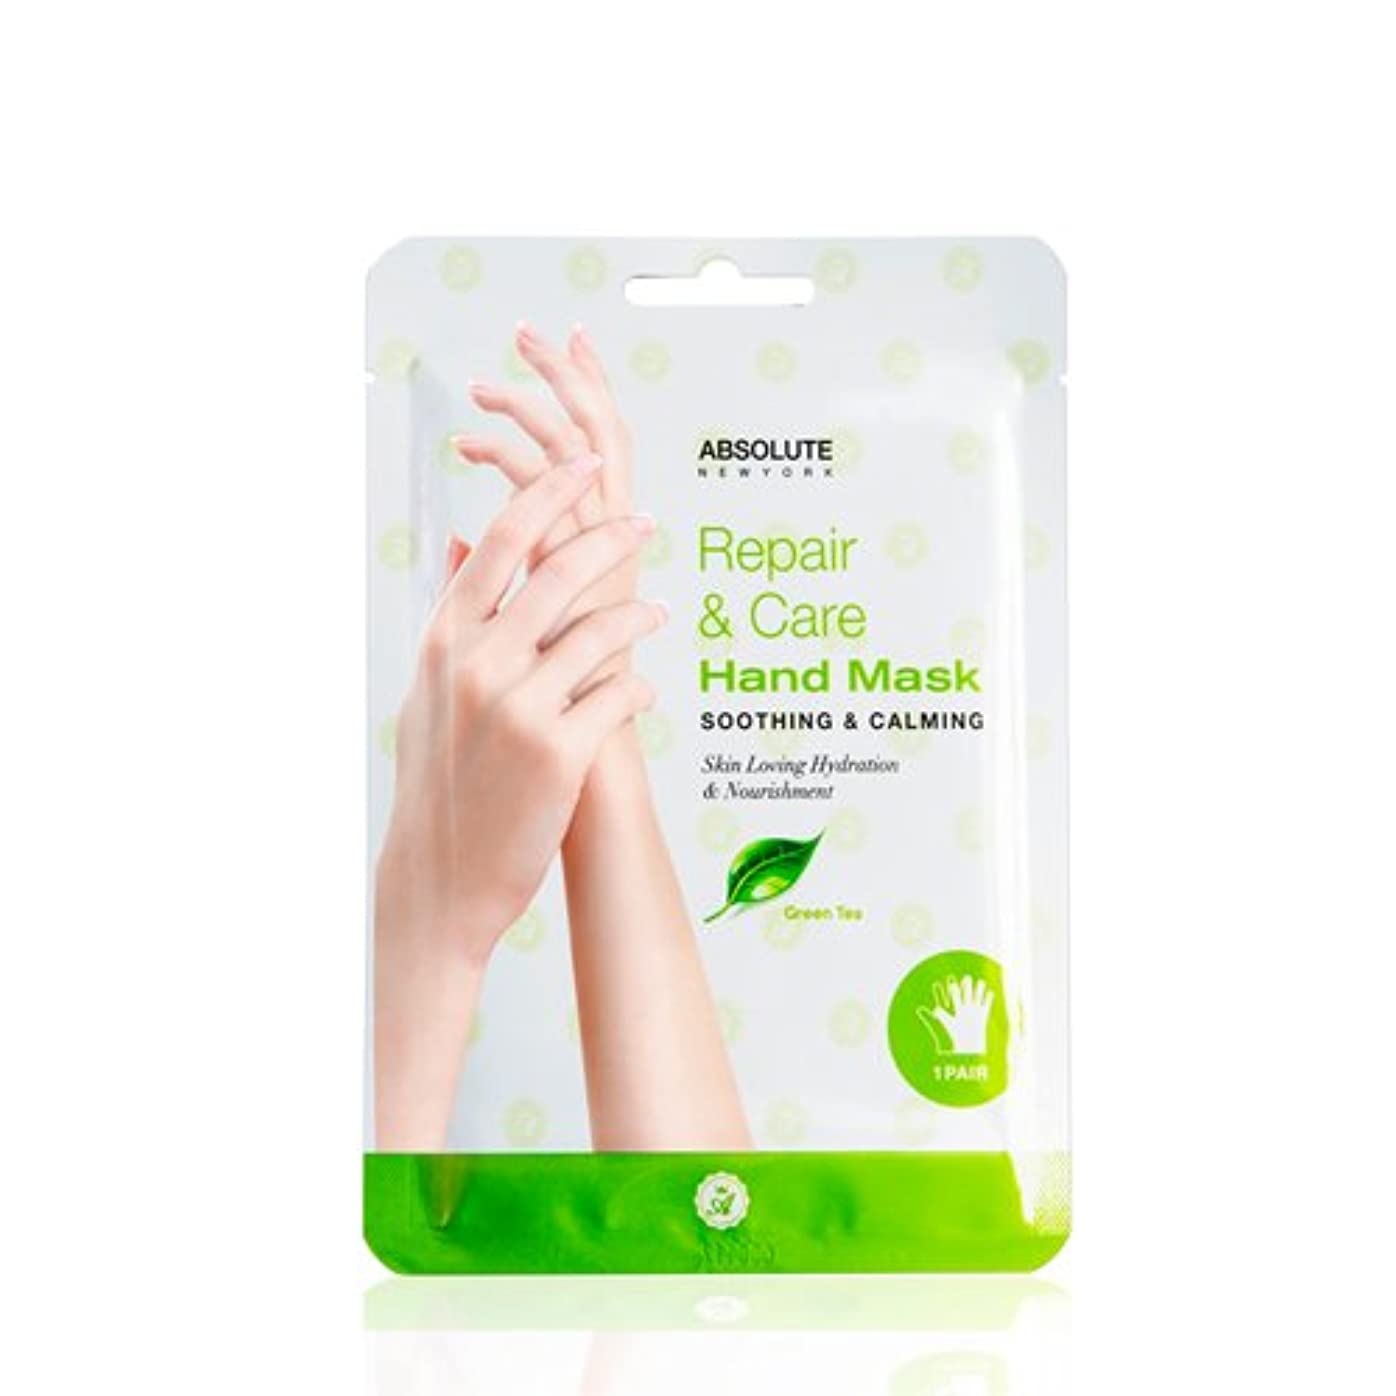 潮純正寺院(3 Pack) Absolute Repair & Care Hand Mask - Green Tea (並行輸入品)